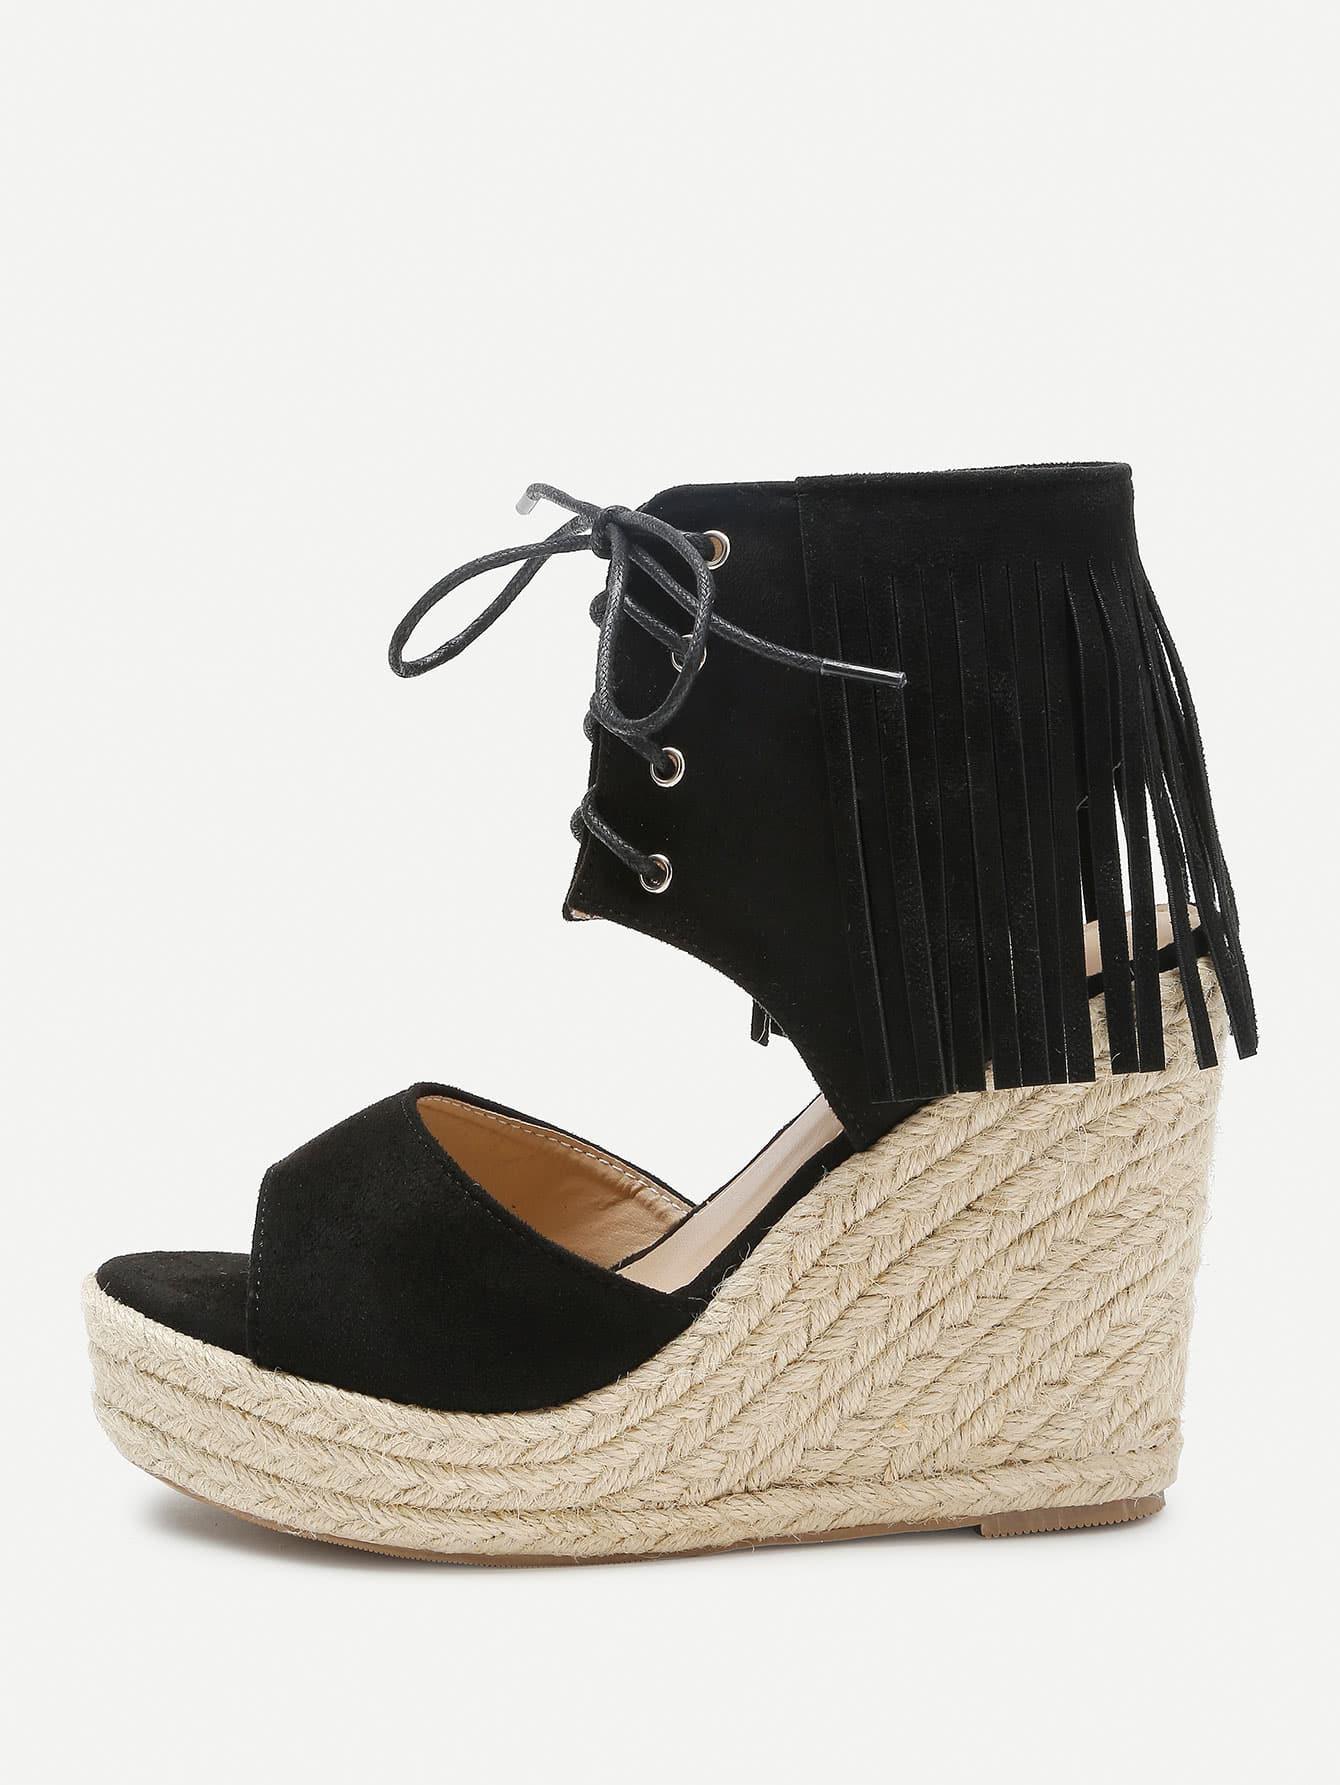 Фото Fringe Design Lace Up Wedge Sandals. Купить с доставкой